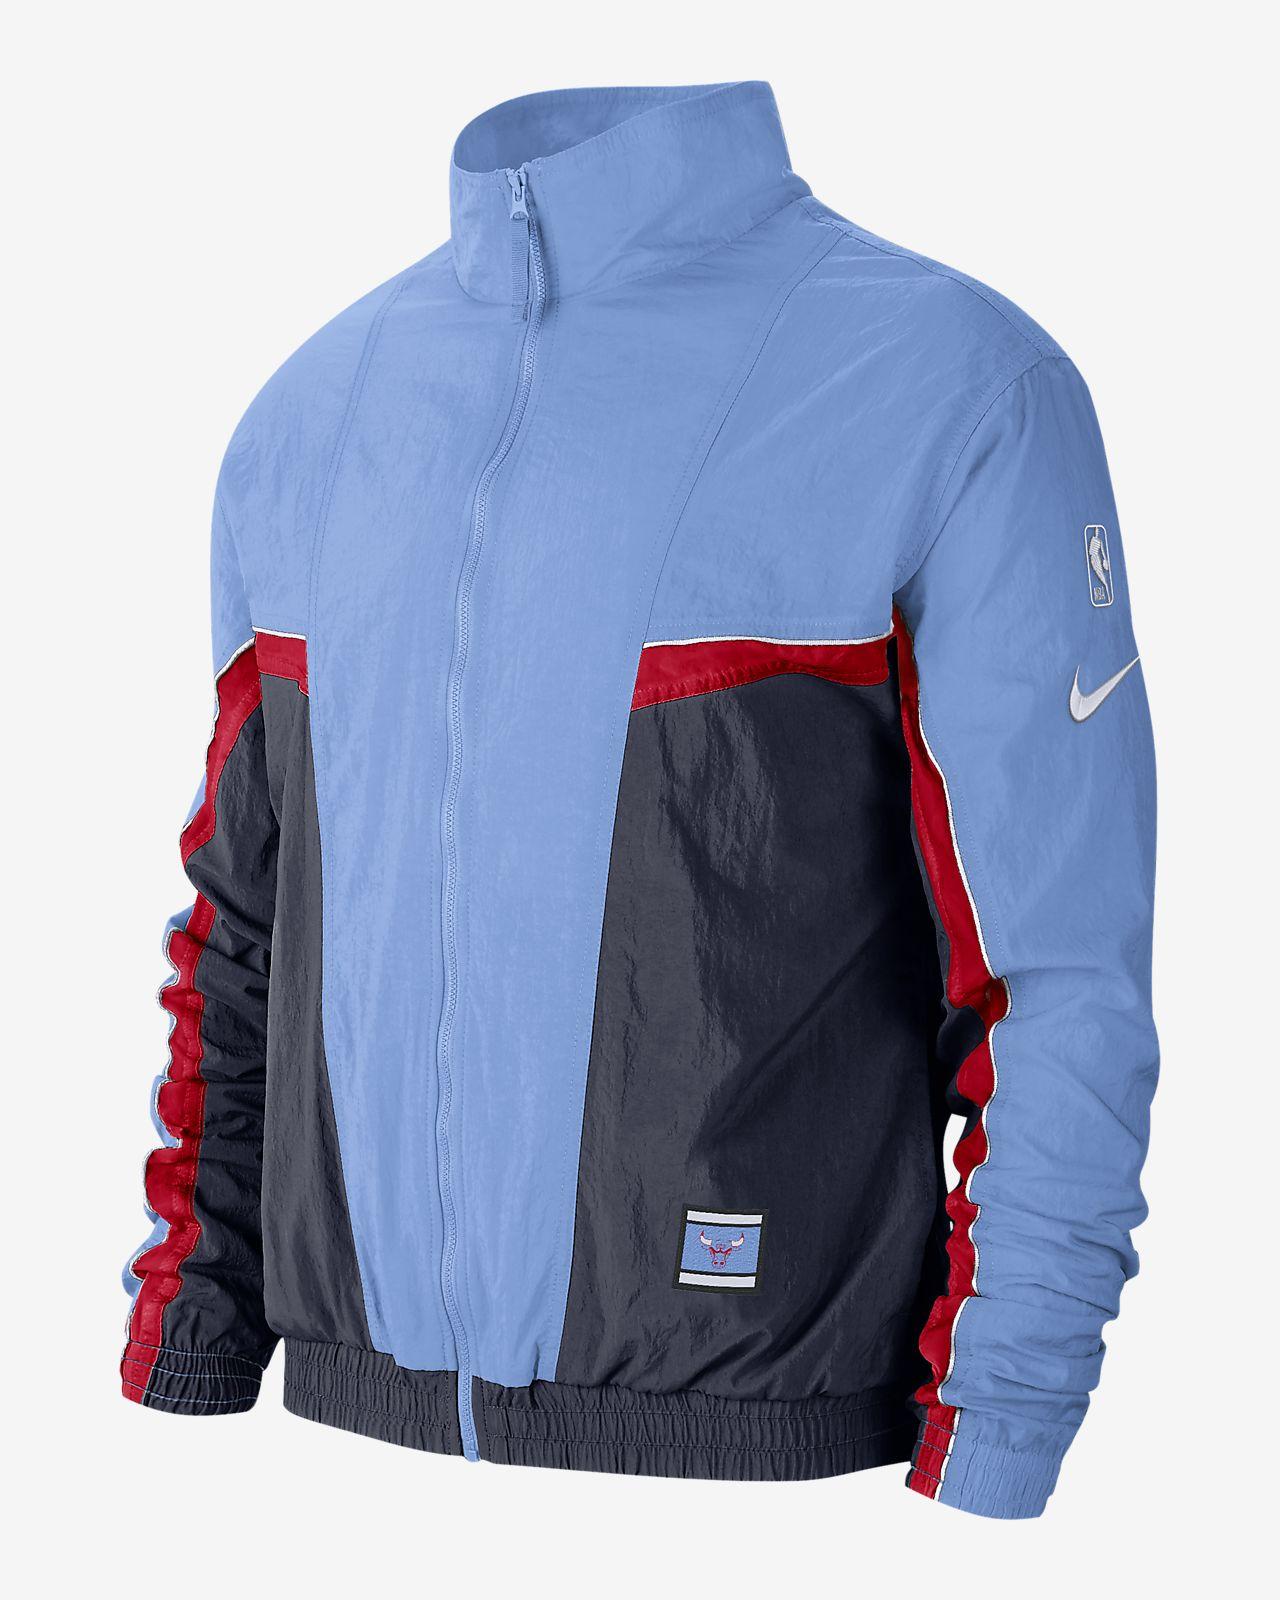 Bulls Courtside City Edition Men's Nike NBA Tracksuit Jacket